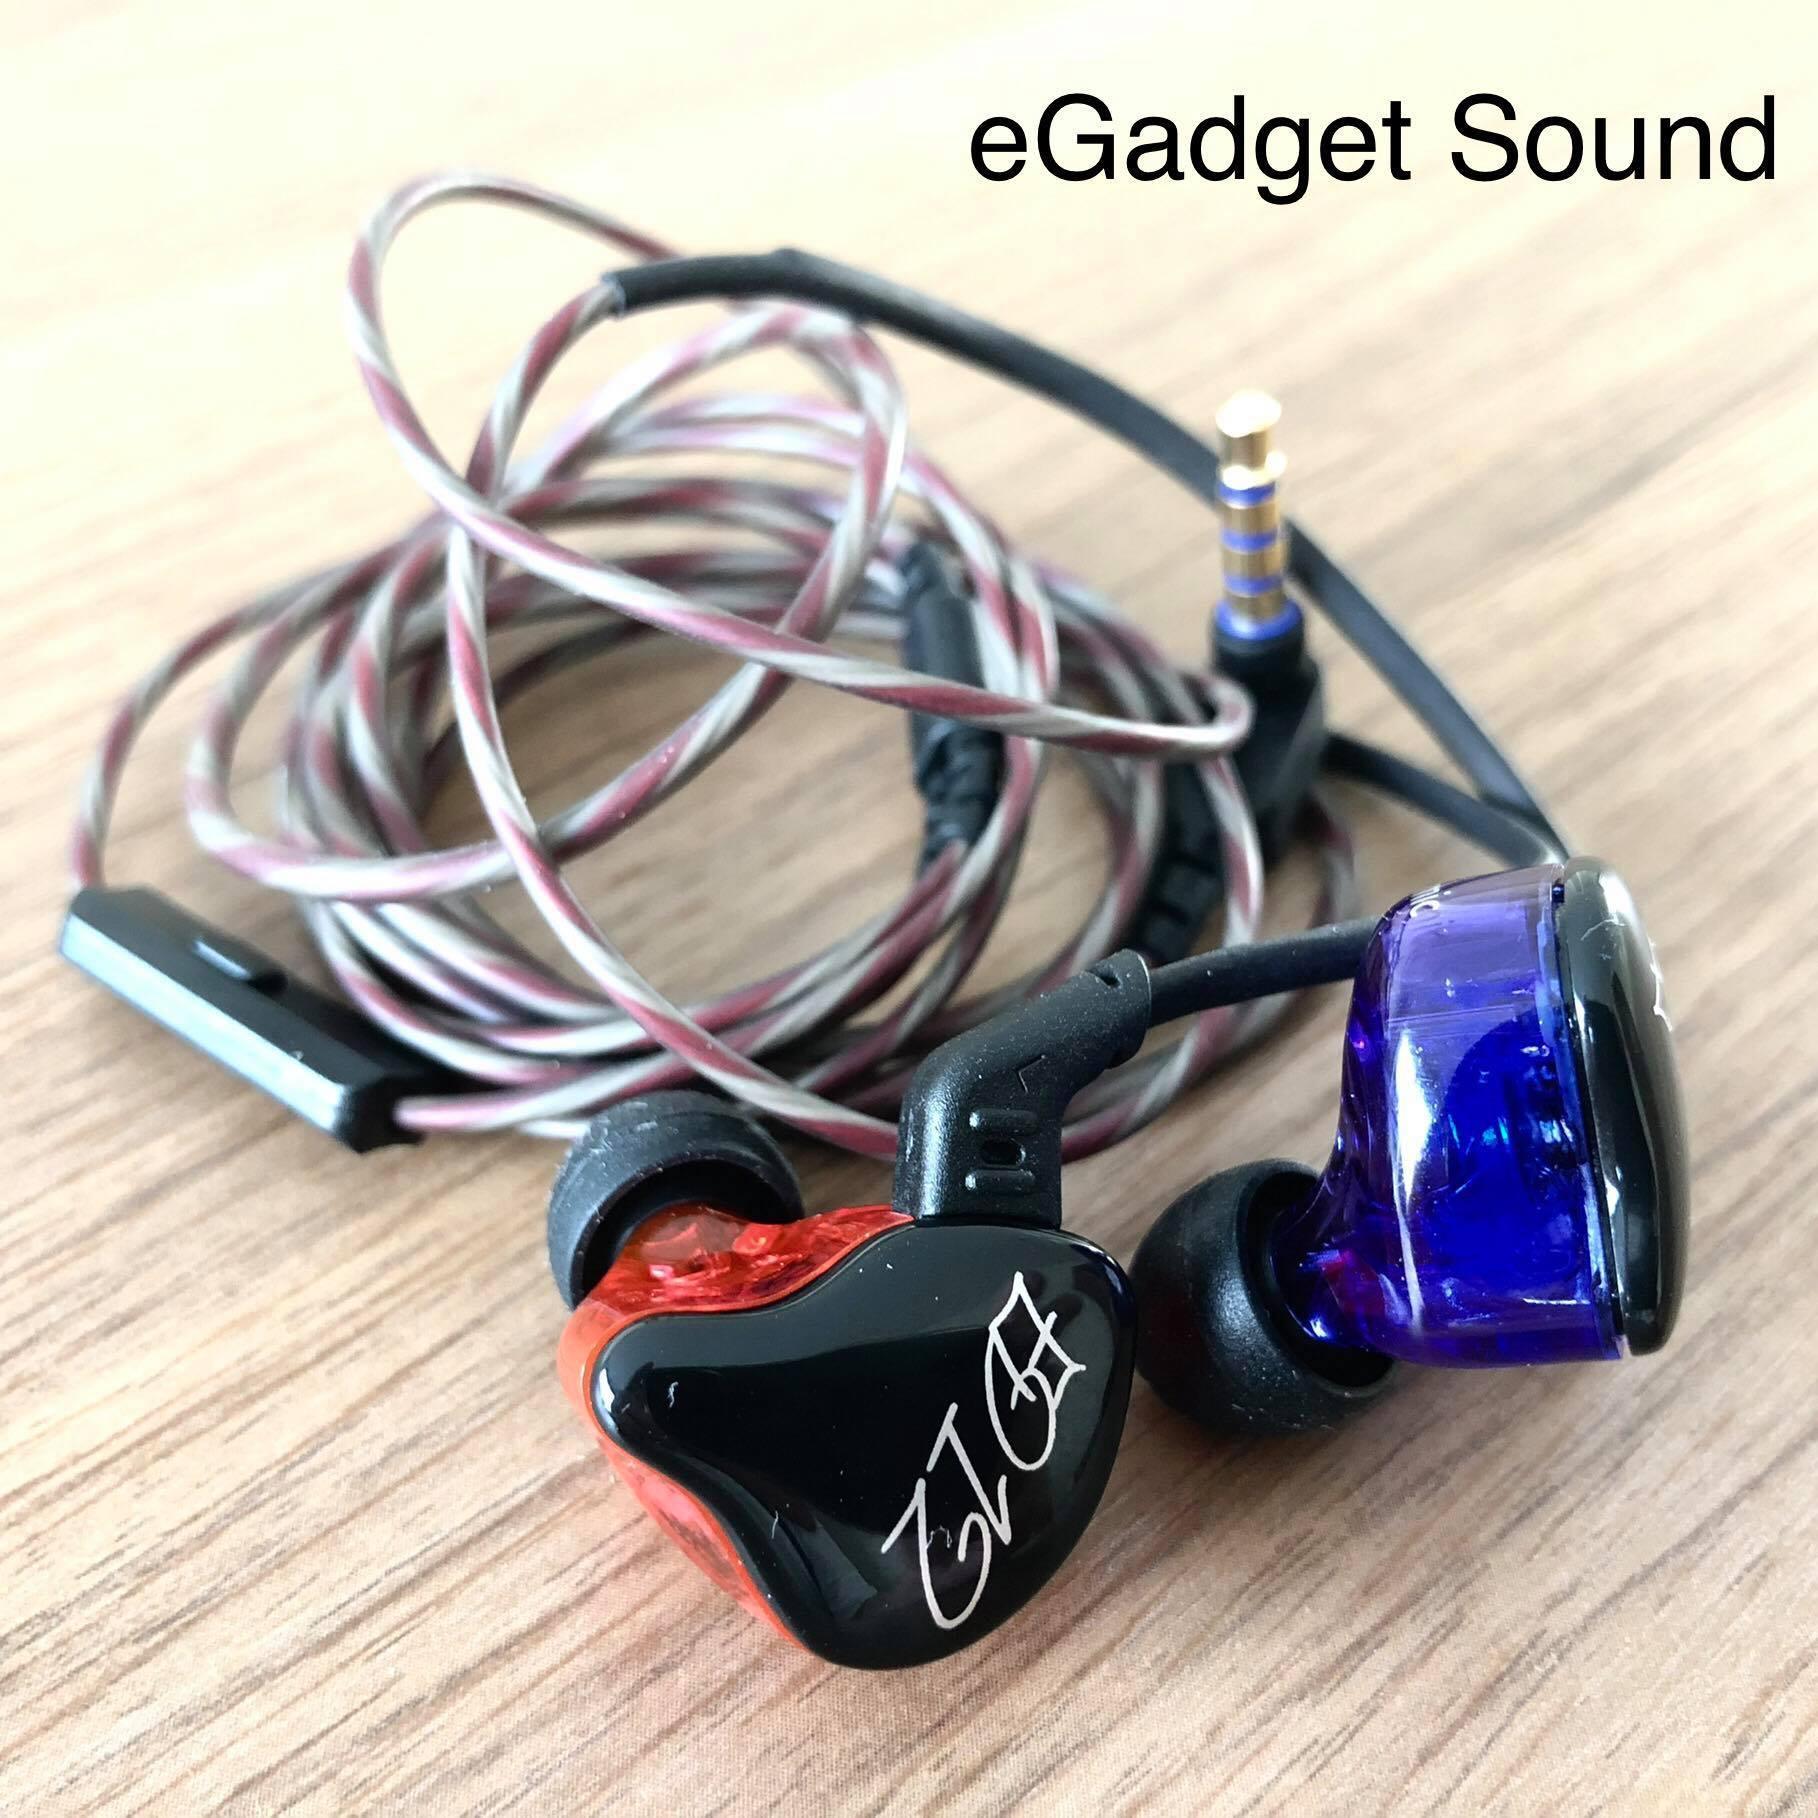 KZ รุ่น ED12 (มีไมค์) หูฟังไดนามิค ไดรเวอร์ ถอดเปลี่ยนสายได้ ประกัน 6 เดือน รูปทรง in ear monitor (IME) เสียงดี มิติครบ KZ ED12 Dynamic Driver Microphone